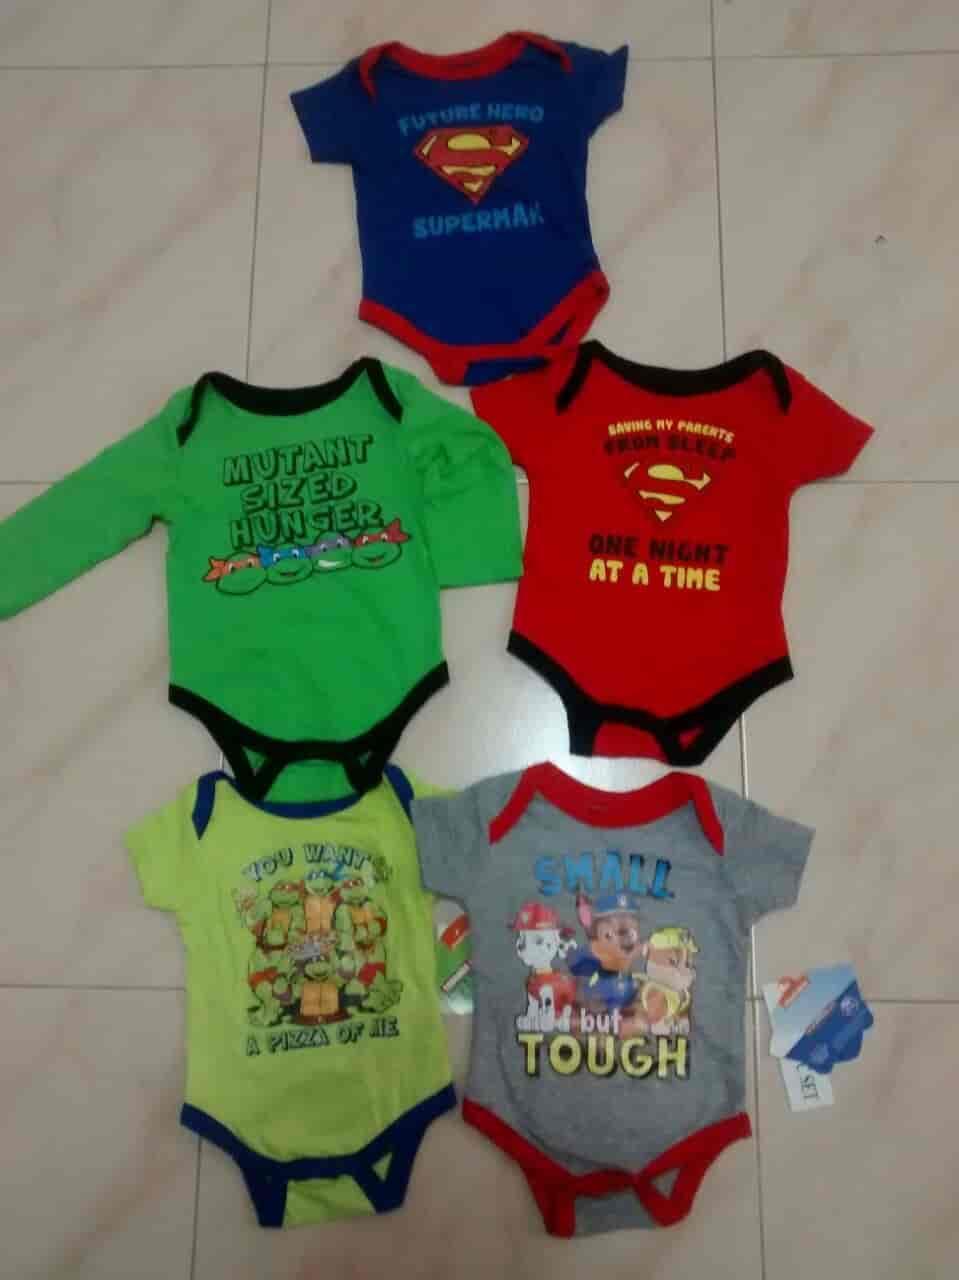 LKG Garments, Court Street - Hosiery T Shirt Manufacturers